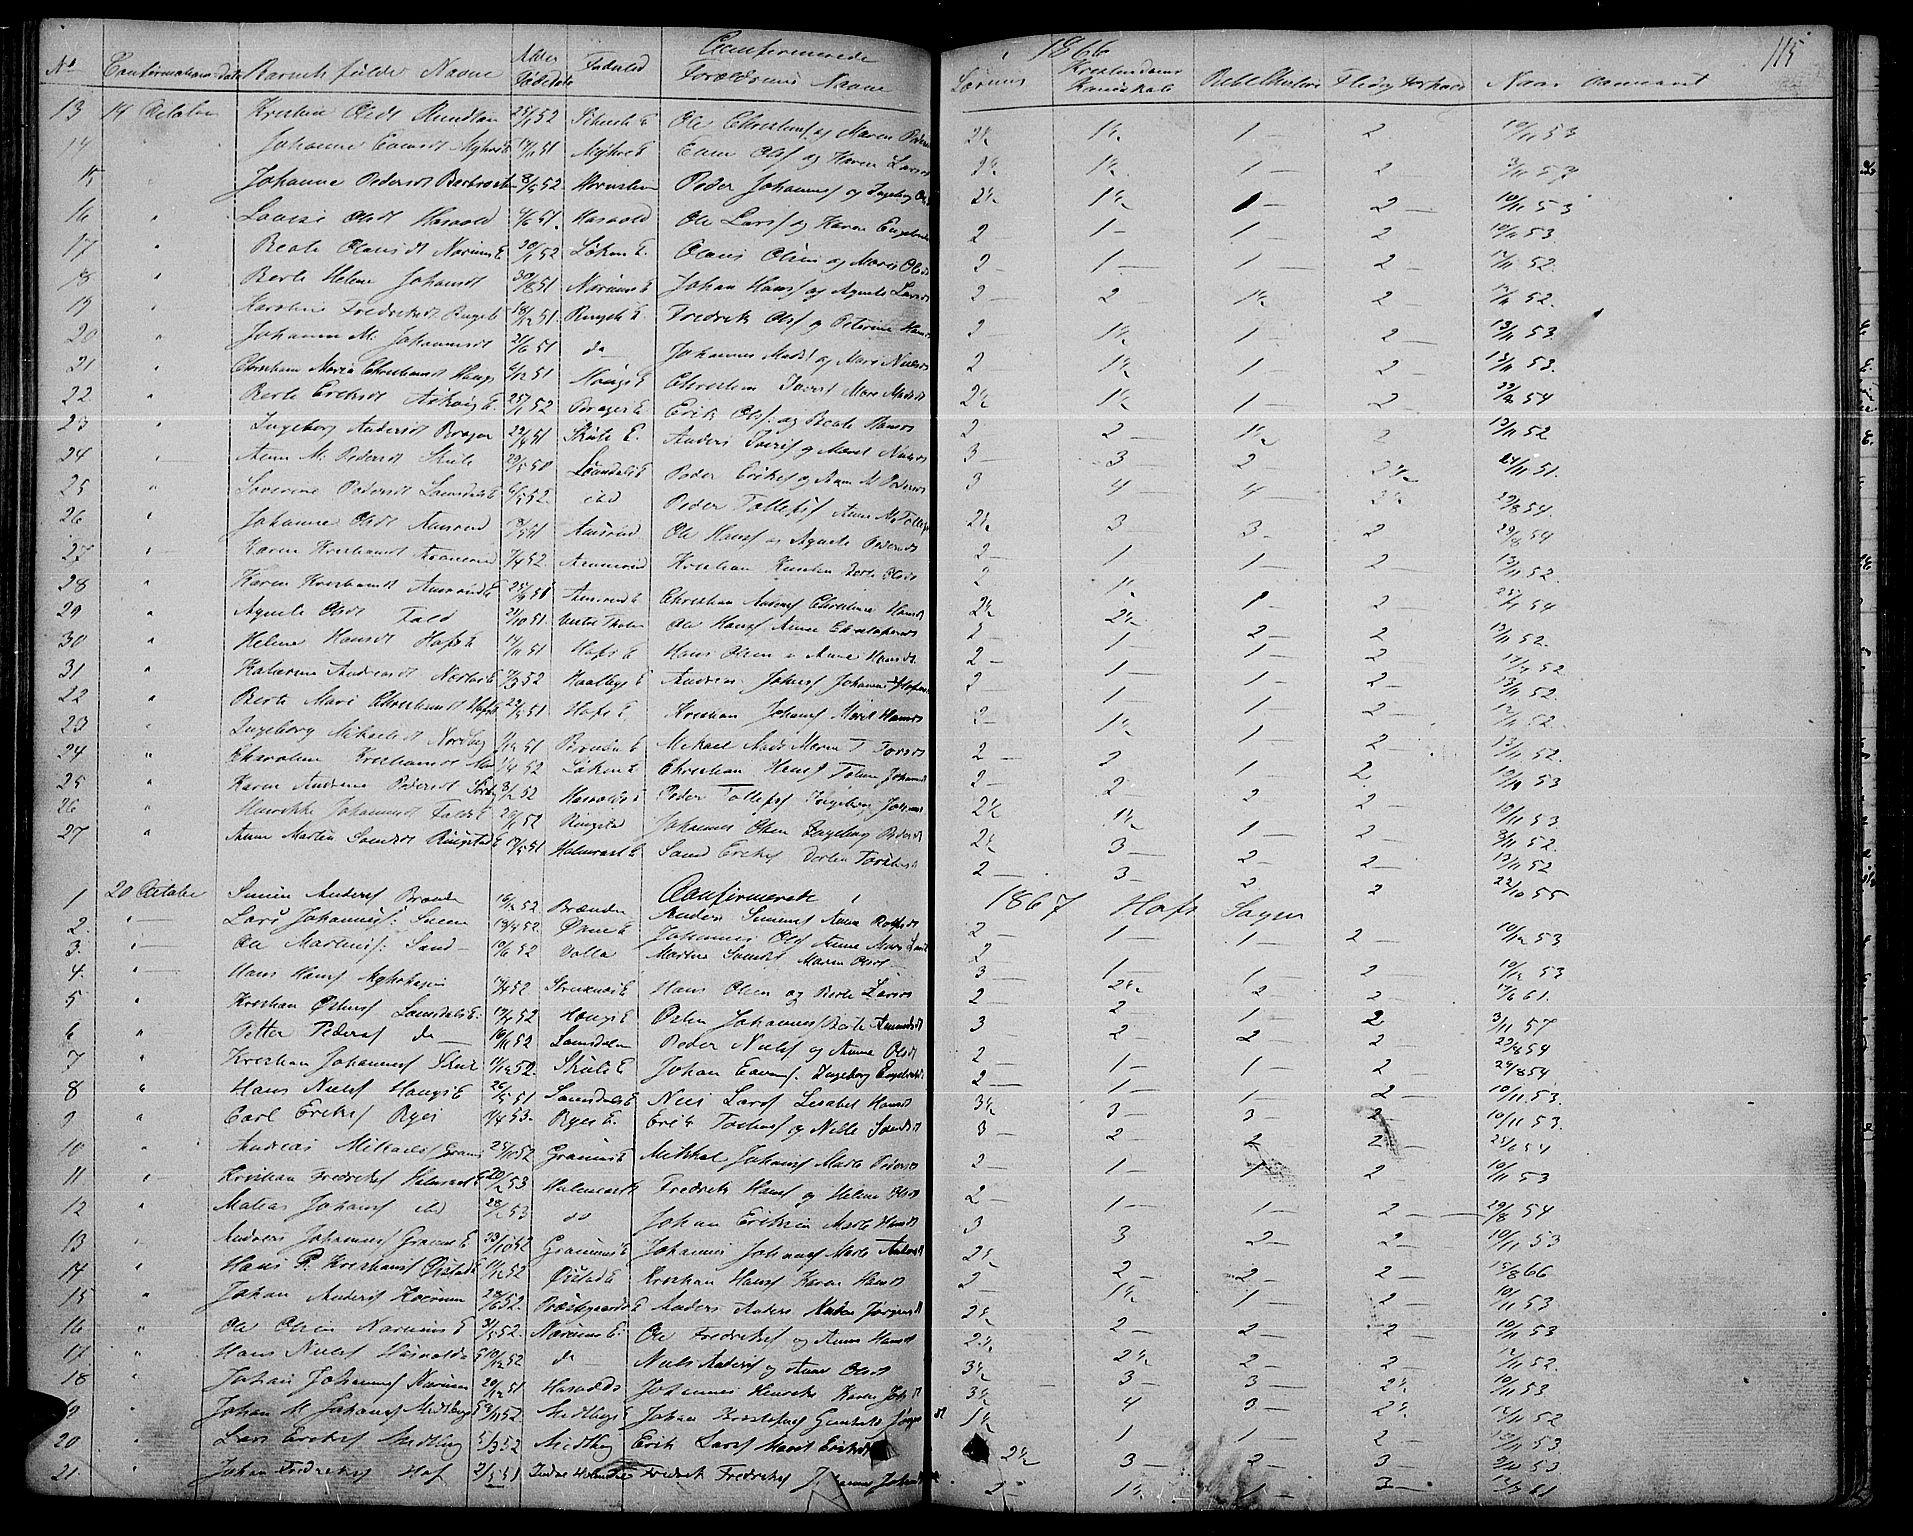 SAH, Søndre Land prestekontor, L/L0001: Klokkerbok nr. 1, 1849-1883, s. 115